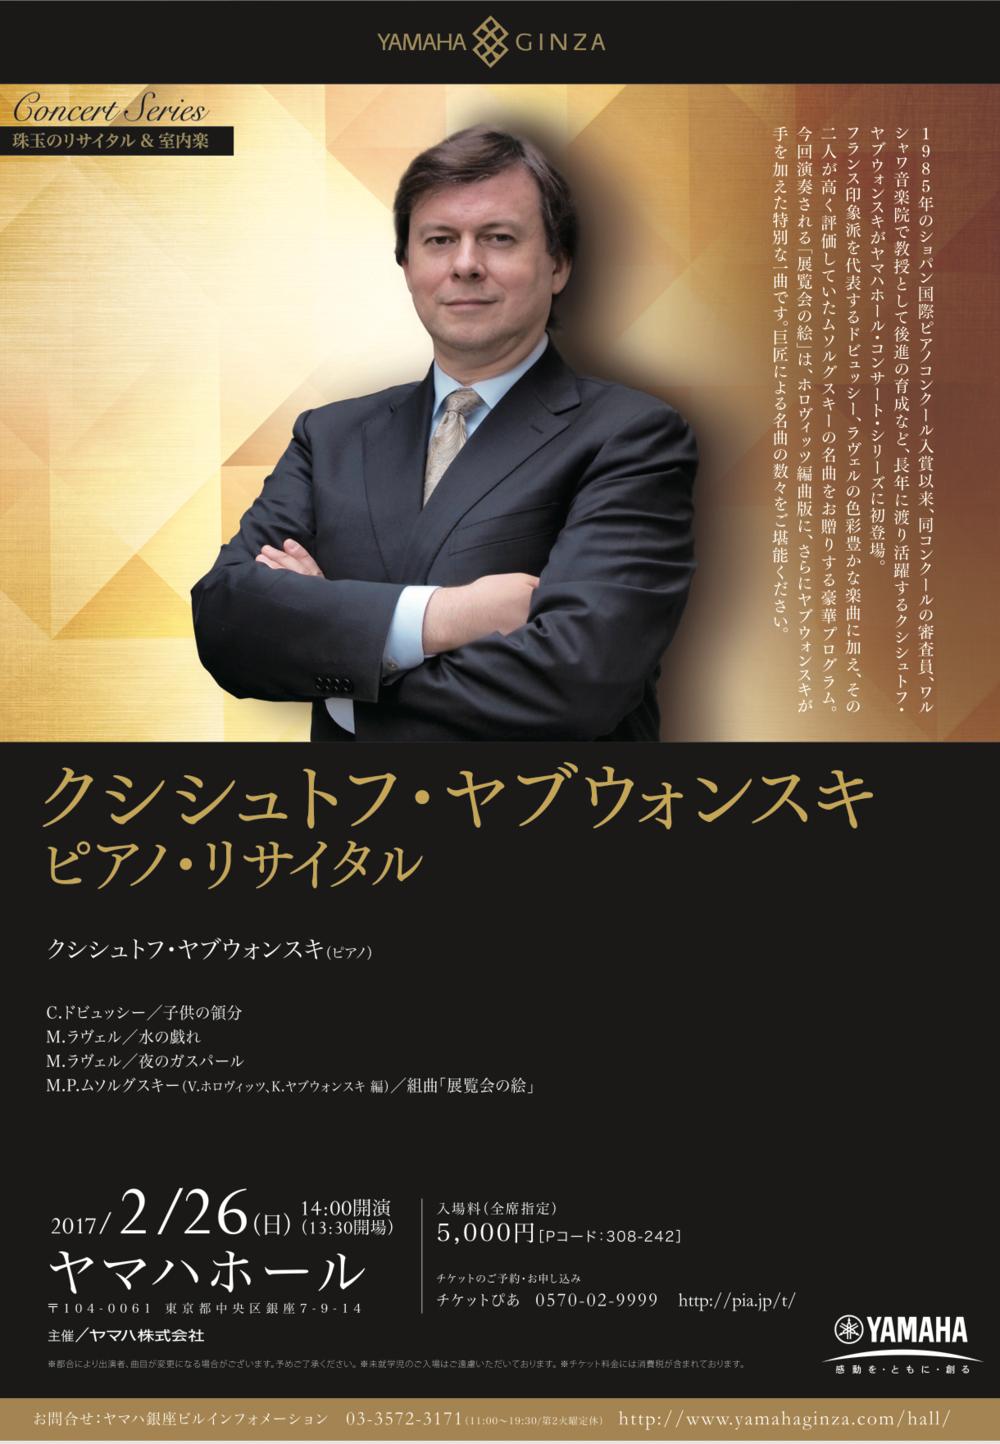 20170226 Tokyo Yamaha (f).PNG